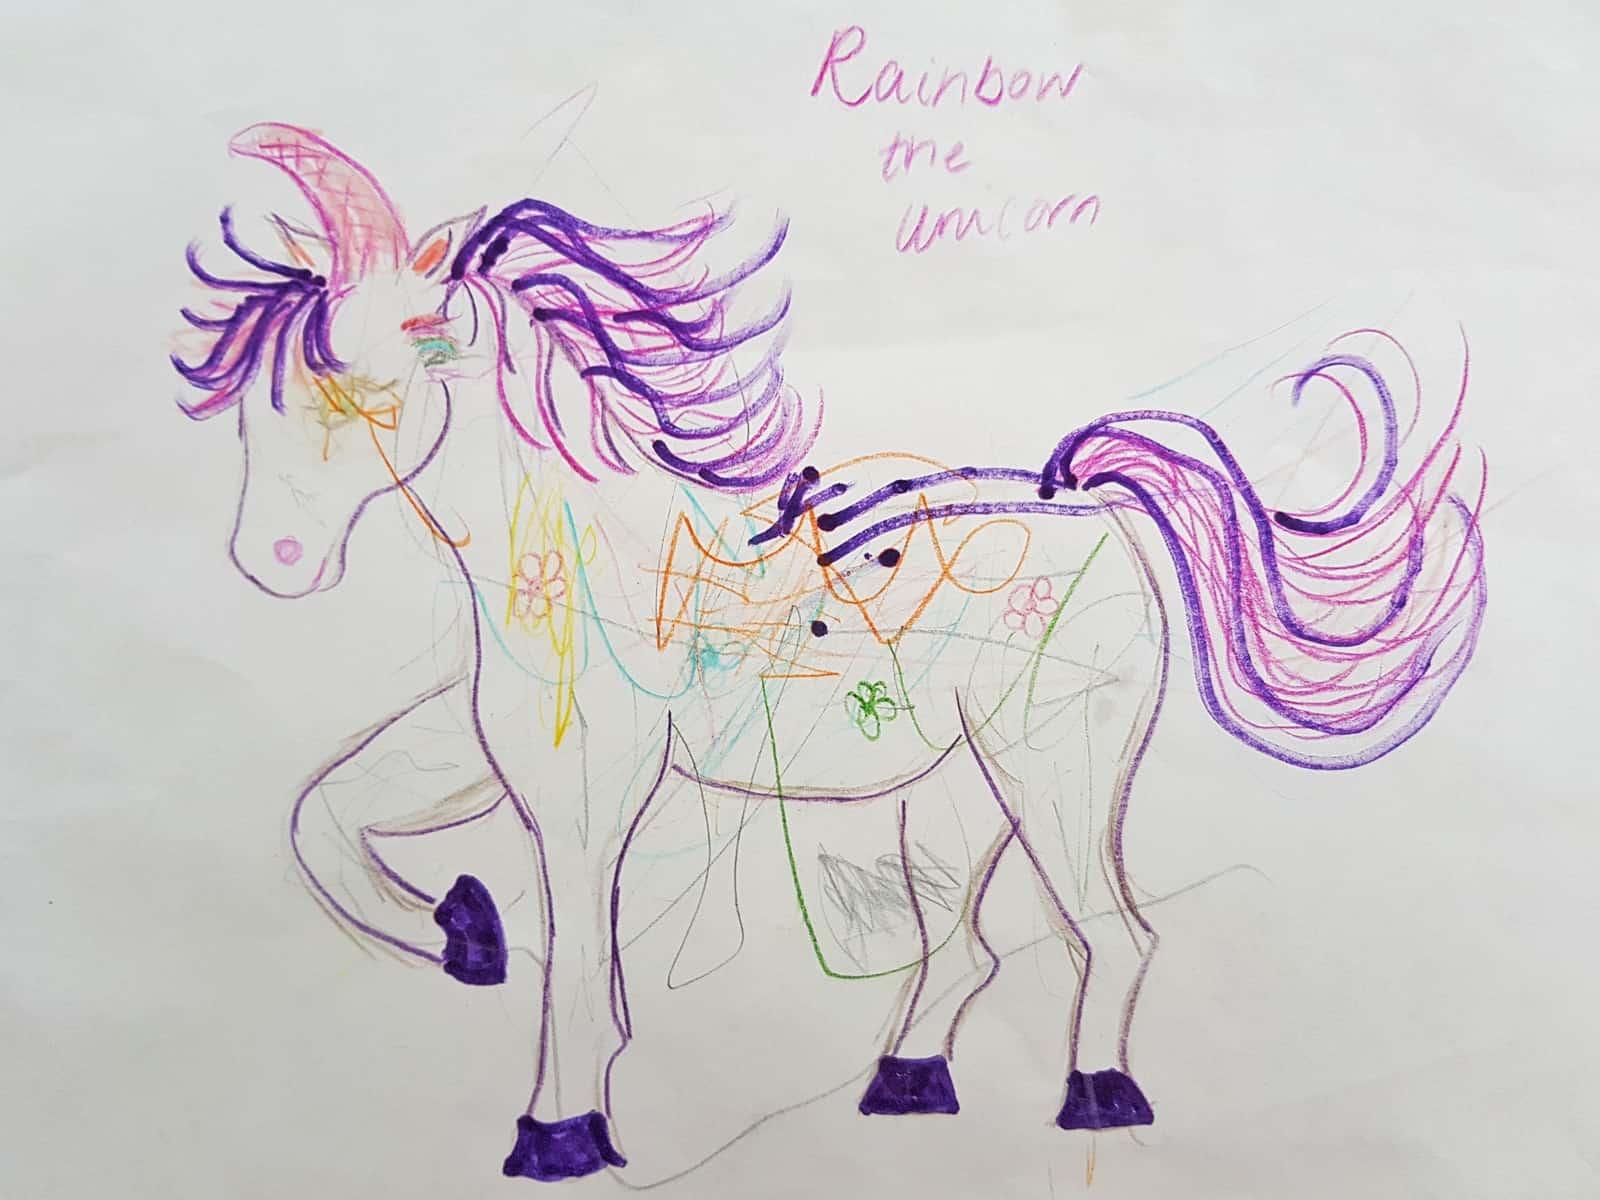 A child's drawing of a unicorn